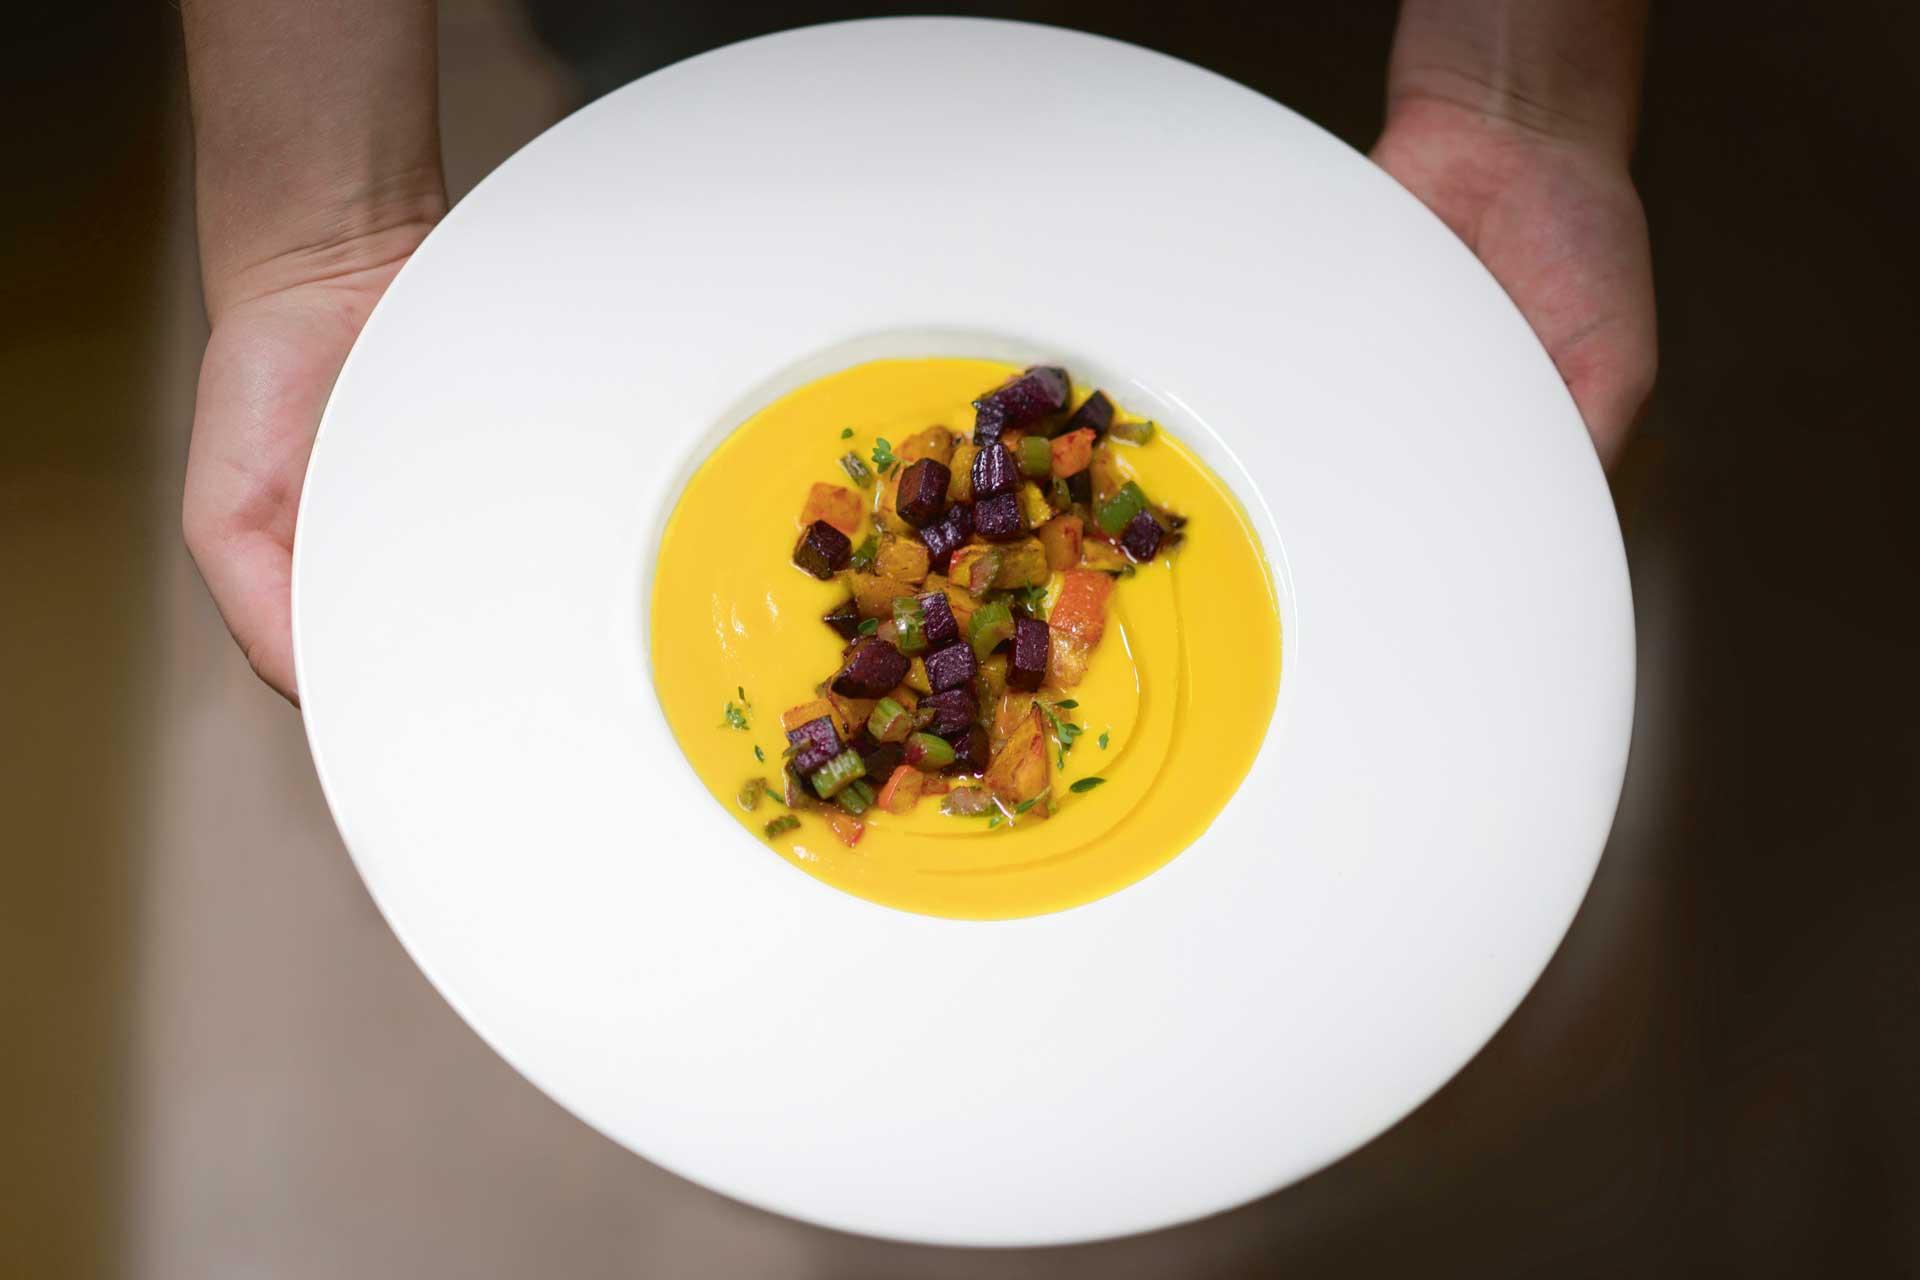 Pumpkin soup dish at Italian hotel La Vimea